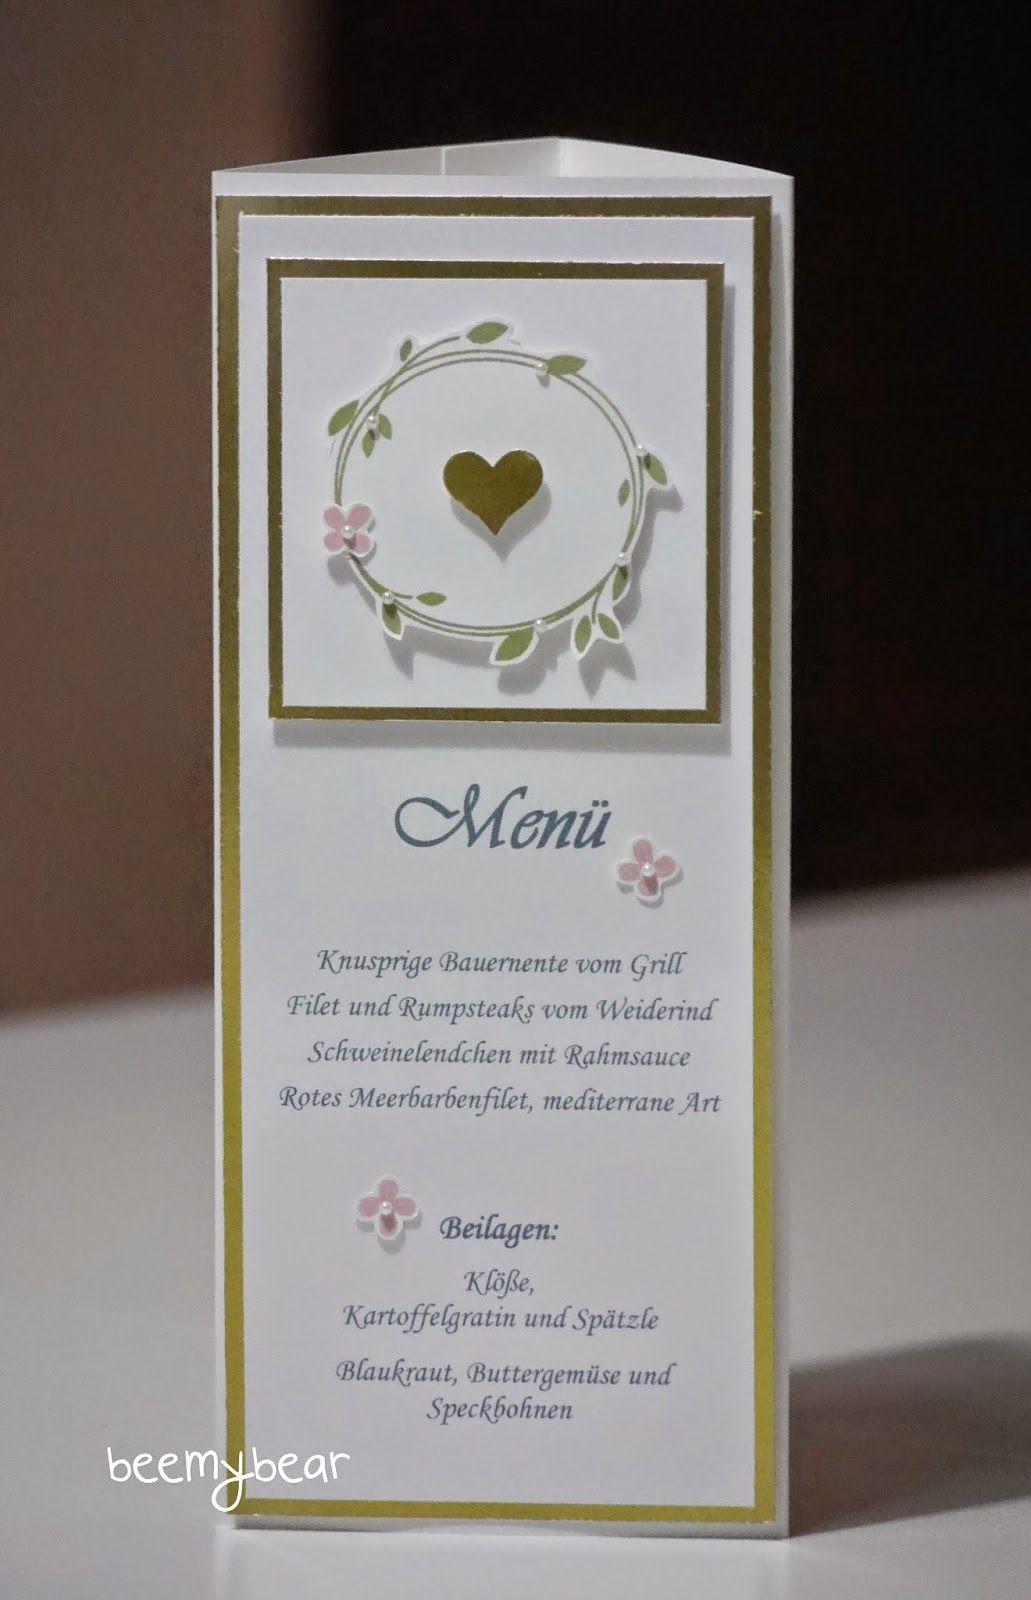 stampin with beemybear: Hochzeit, Menükarte, Stampin'up, Perfekter Tag